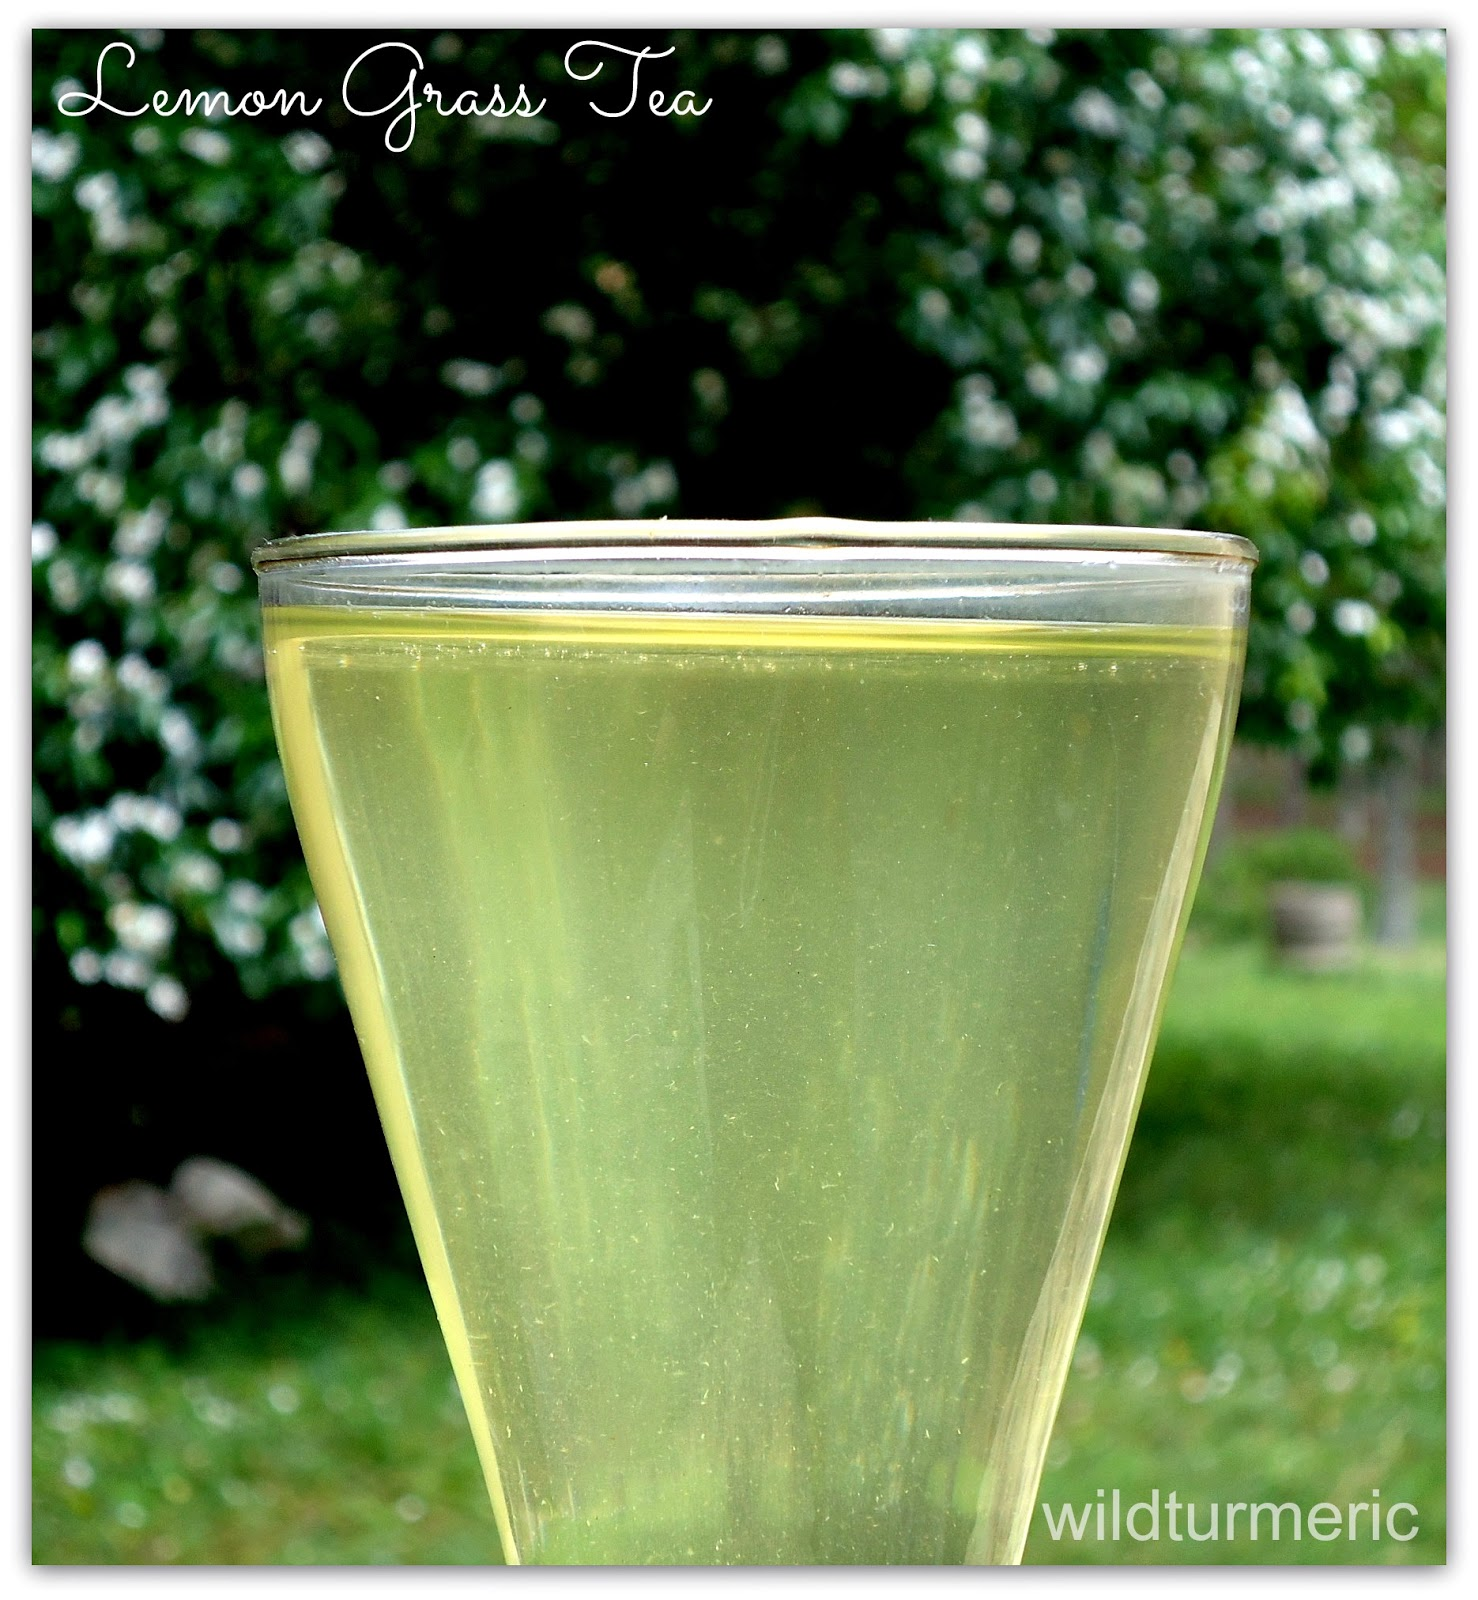 8 Top Benefits & Uses Of Lemongrass Tea for Hair, Skin & Health